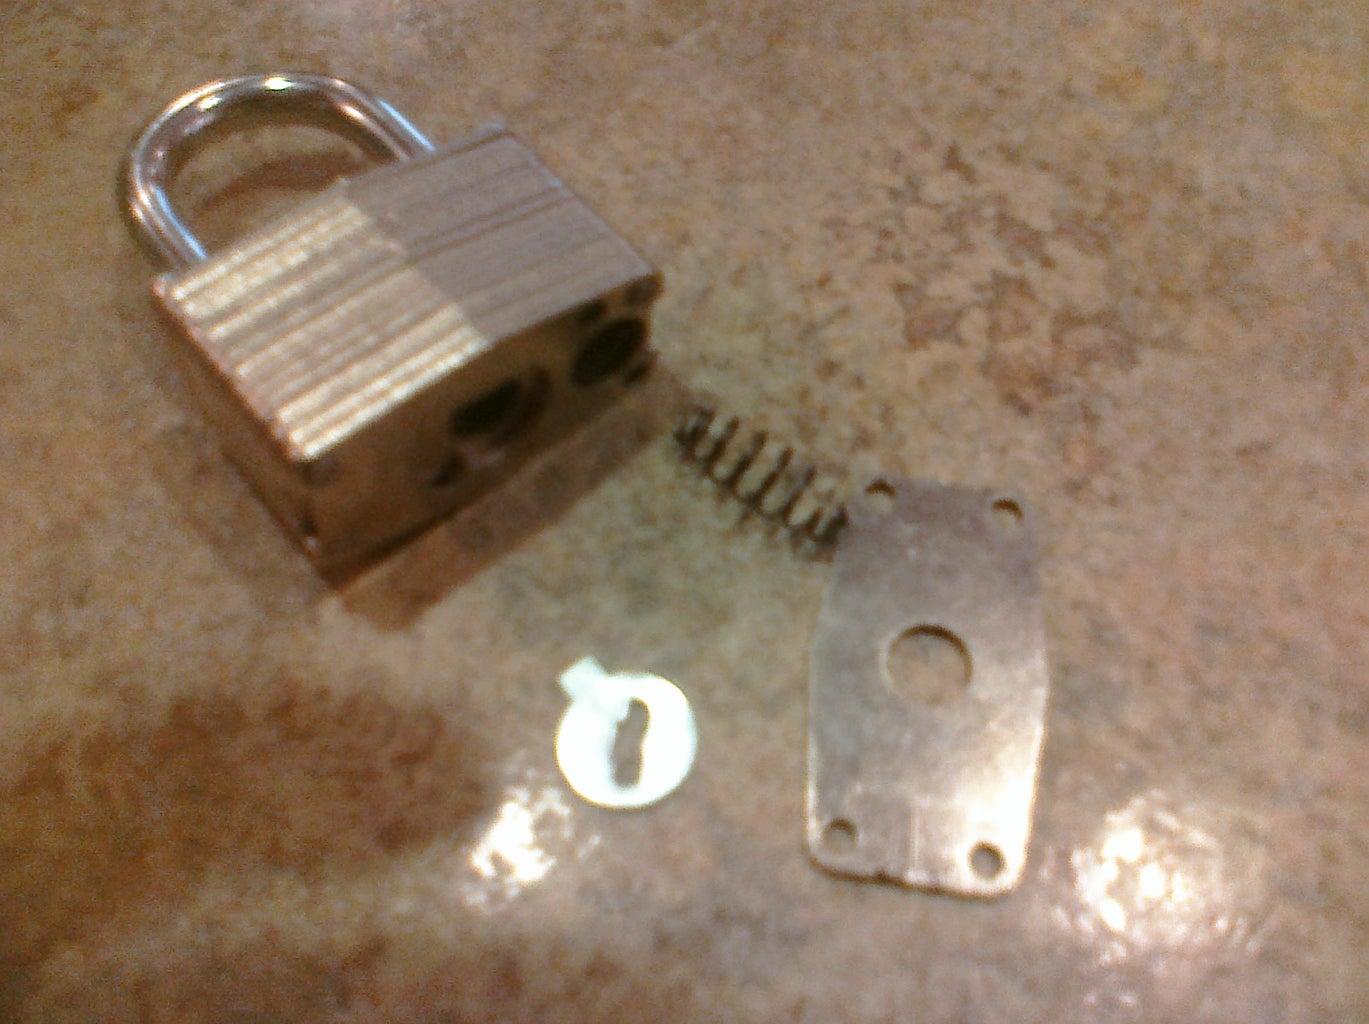 Dissassemble the Lock